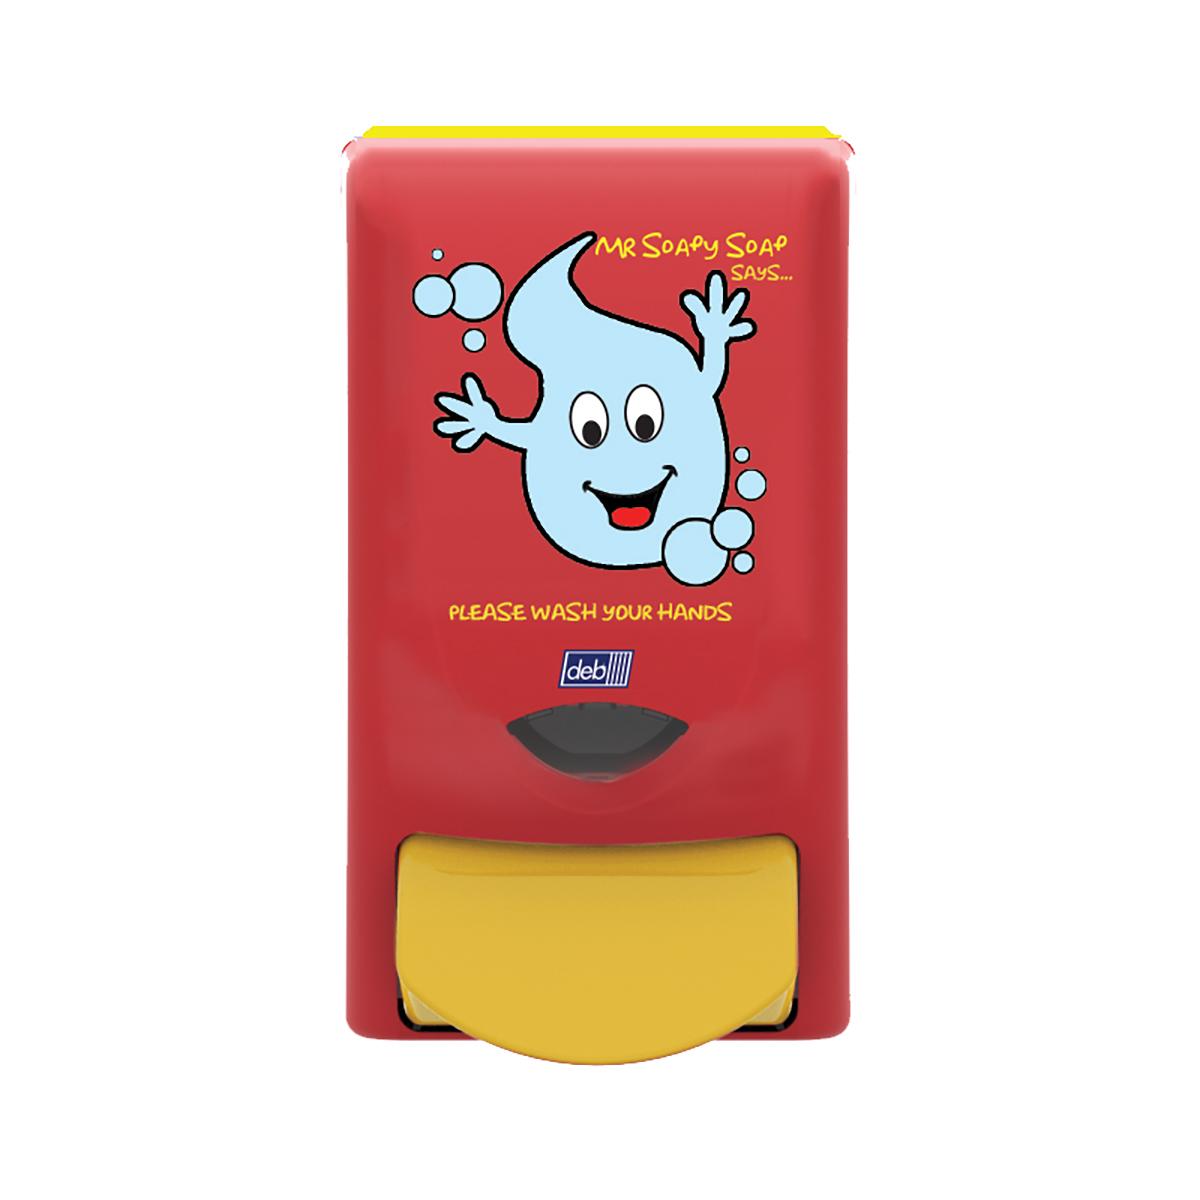 DEB Clear Foaming Hand Soap Refill Cartridge 1 Litre Ref N03869&FOC Mr Soapy [Free Dispenser]